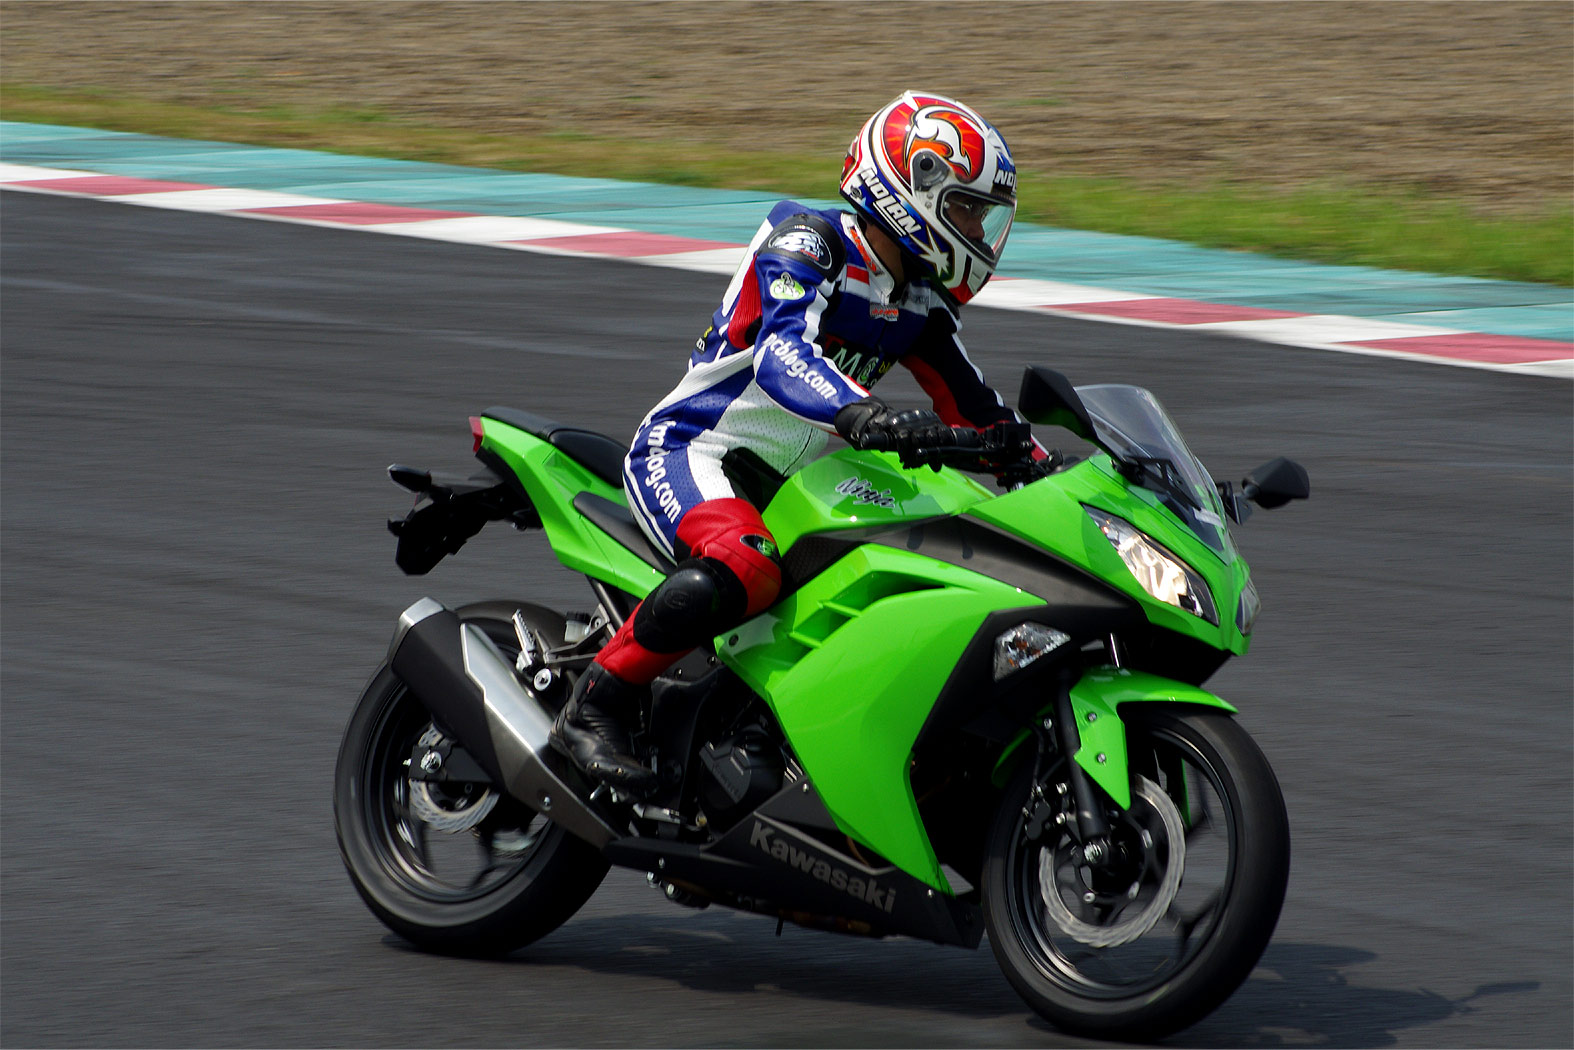 2013 Kawasaki Ninja 250